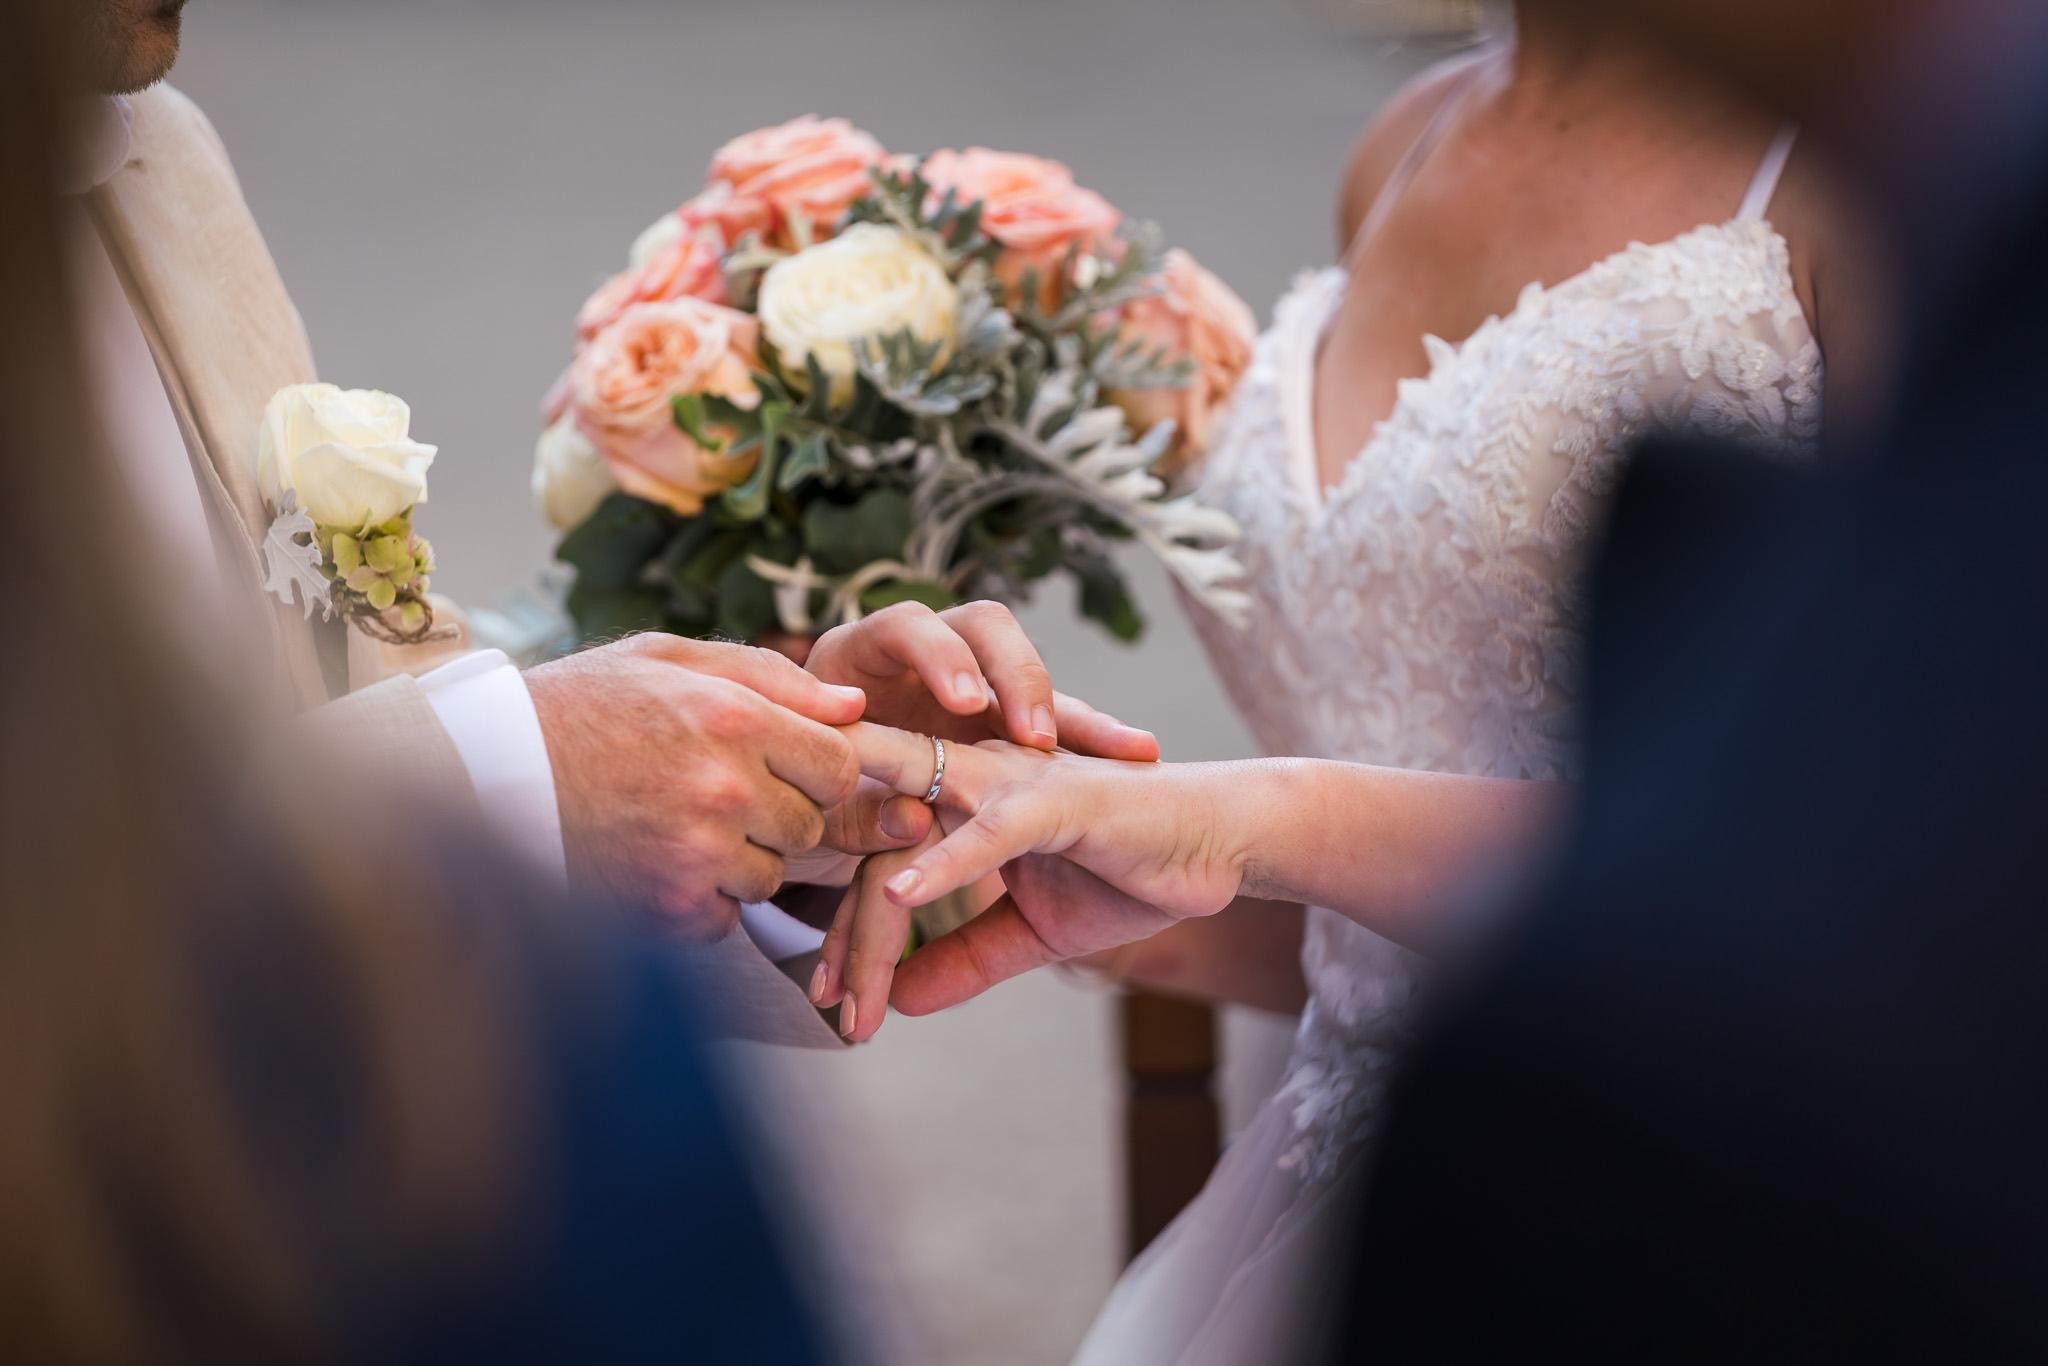 NC-2018-09-07_gemma-and-steve-wedding-1359.jpg